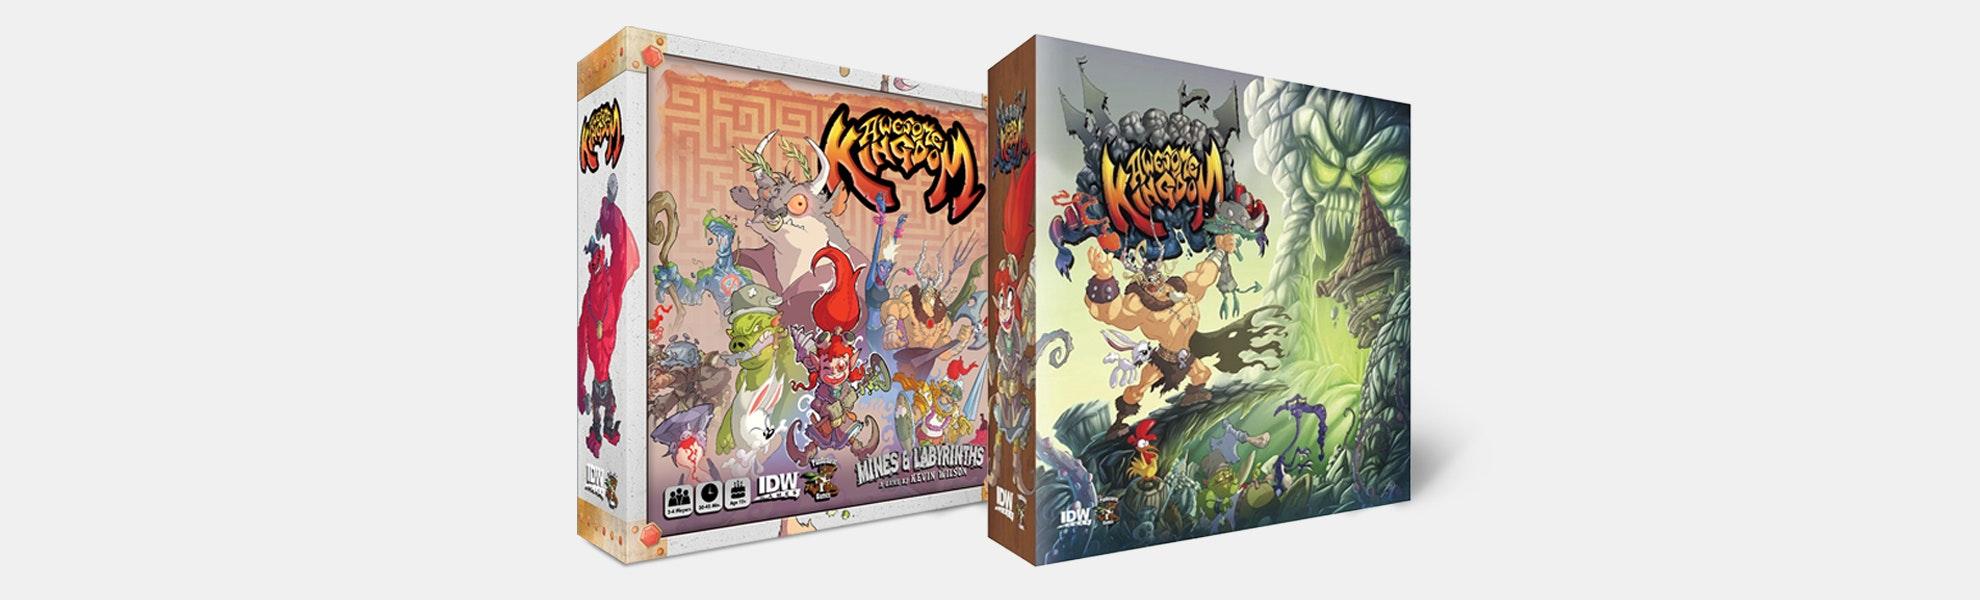 Awesome Kingdom Board Game Bundle